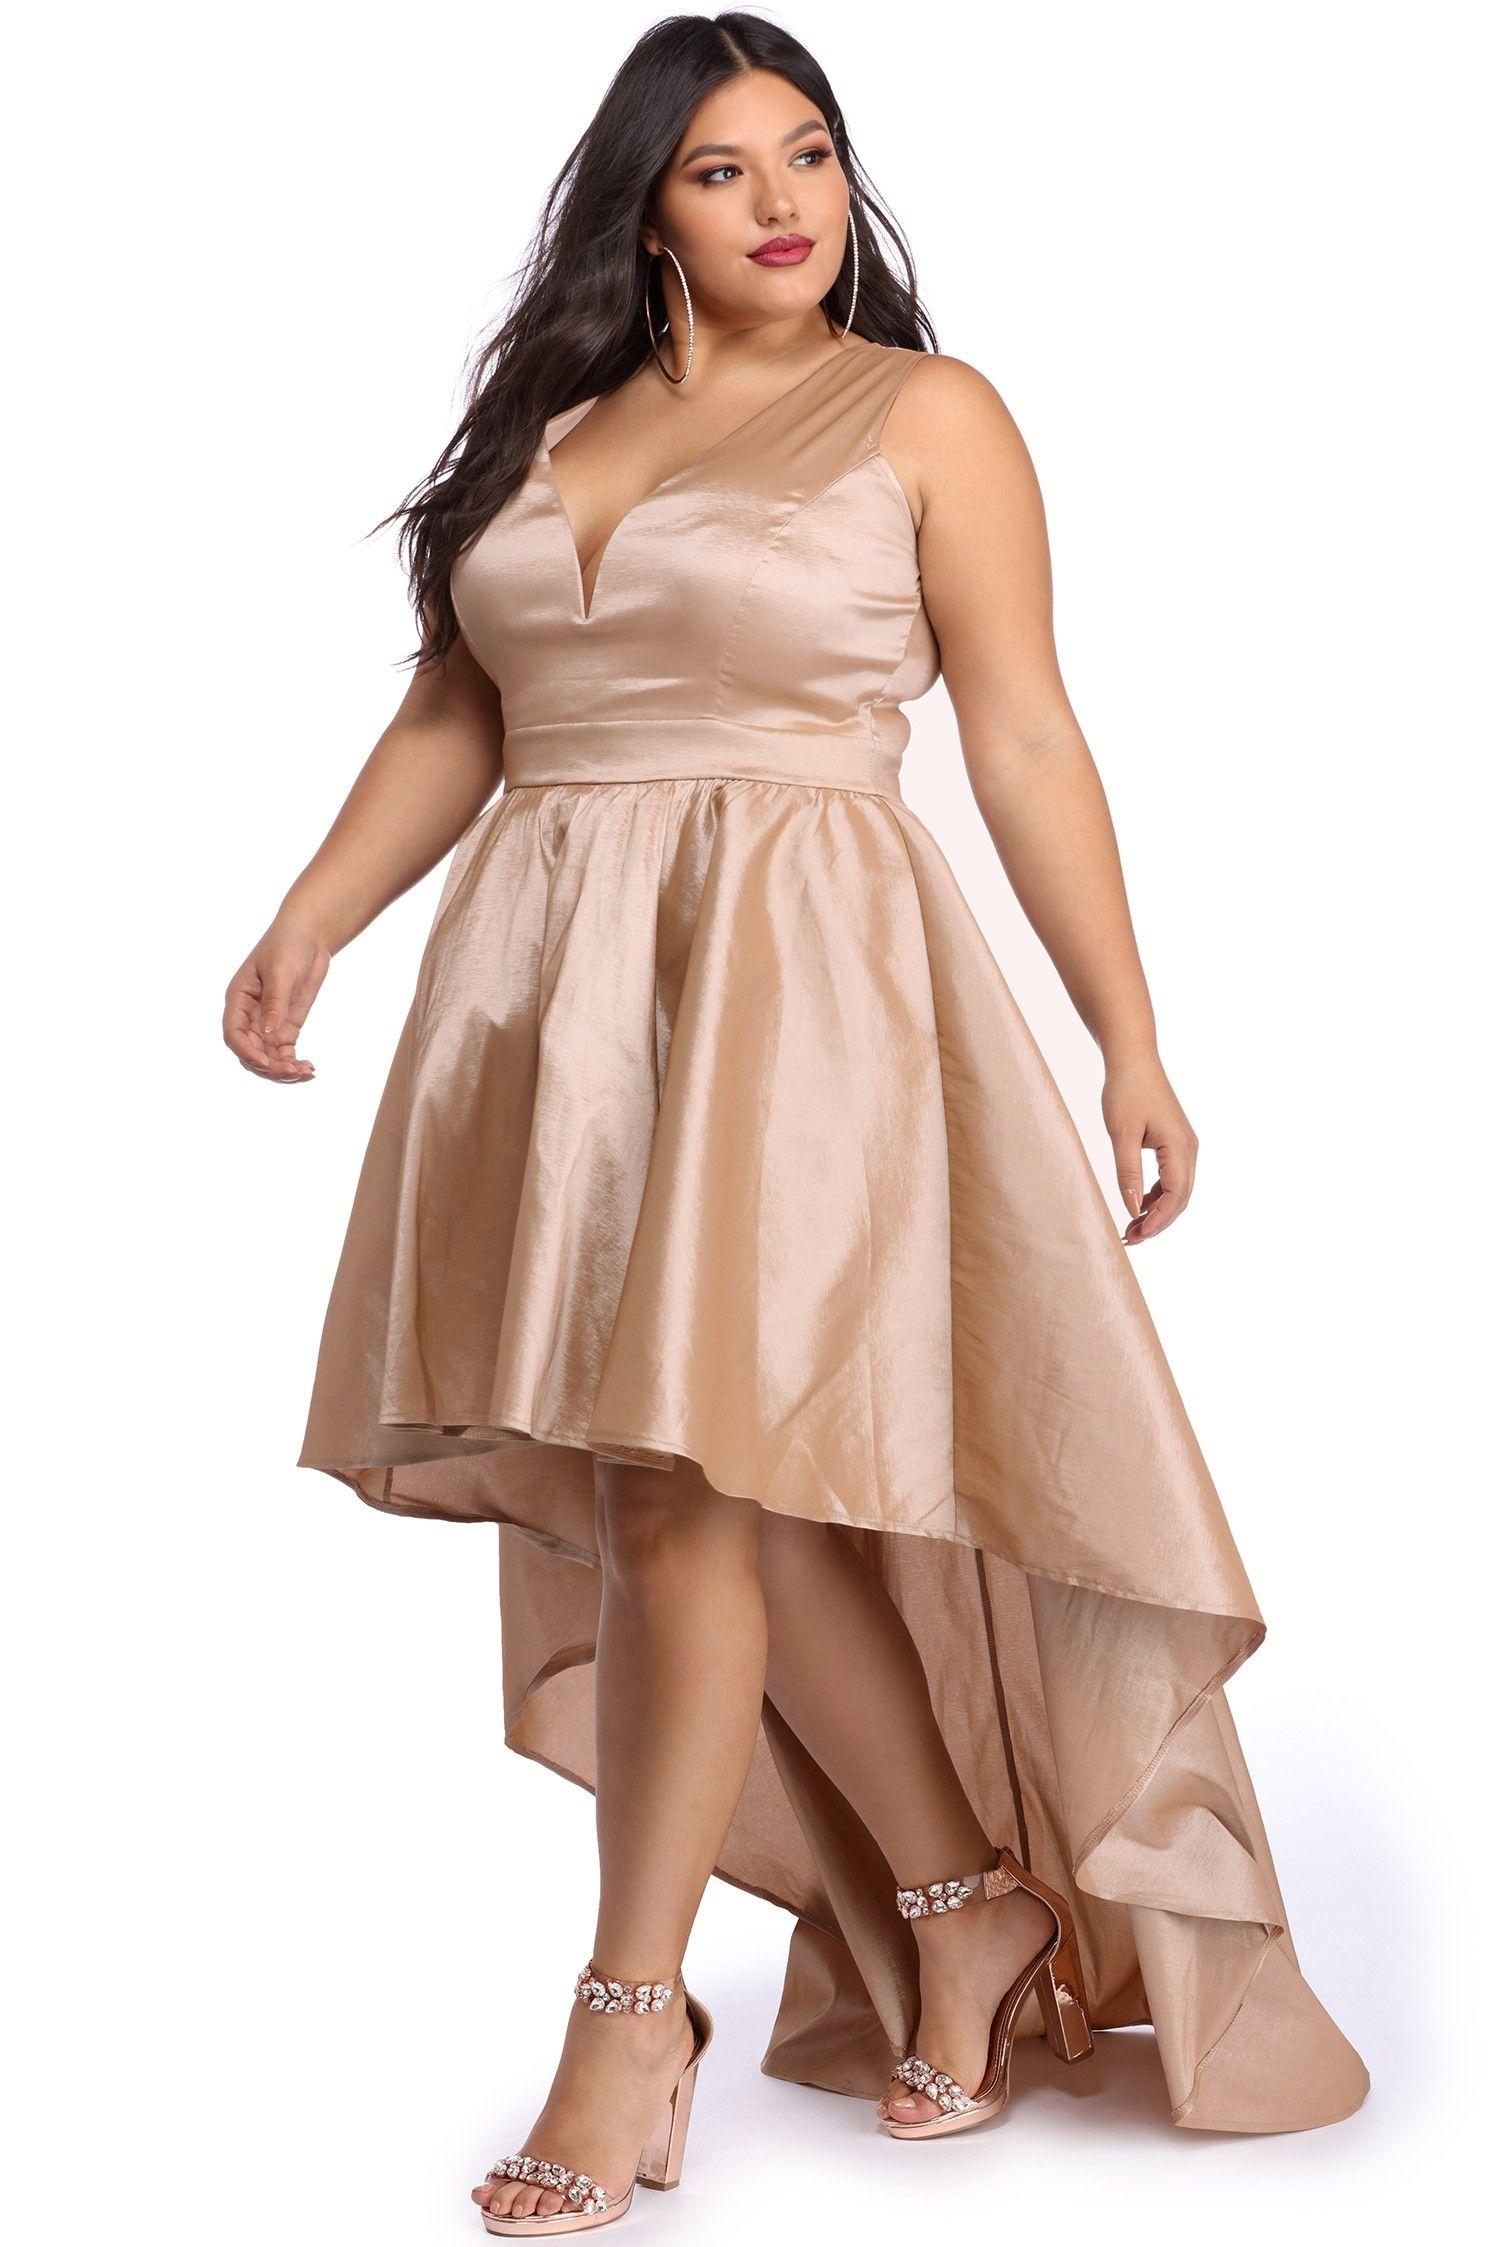 Plus lizzie taupe classic twist formal dress beautiful woman